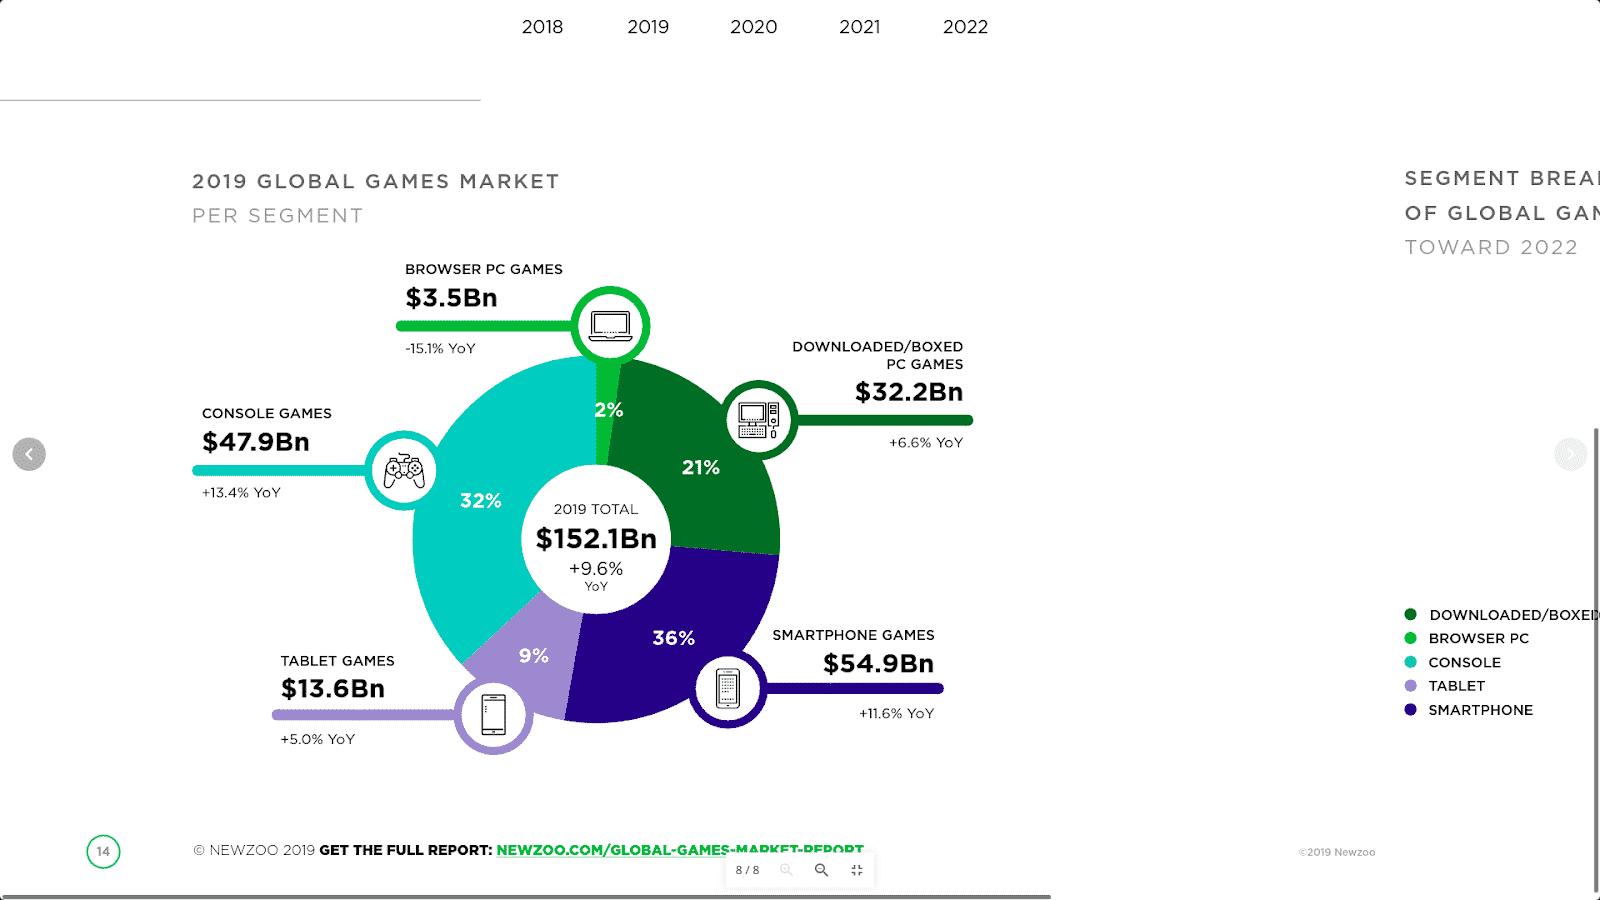 Full report: https://newzoo.com/solutions/standard/market-forecasts/global-games-market-report/